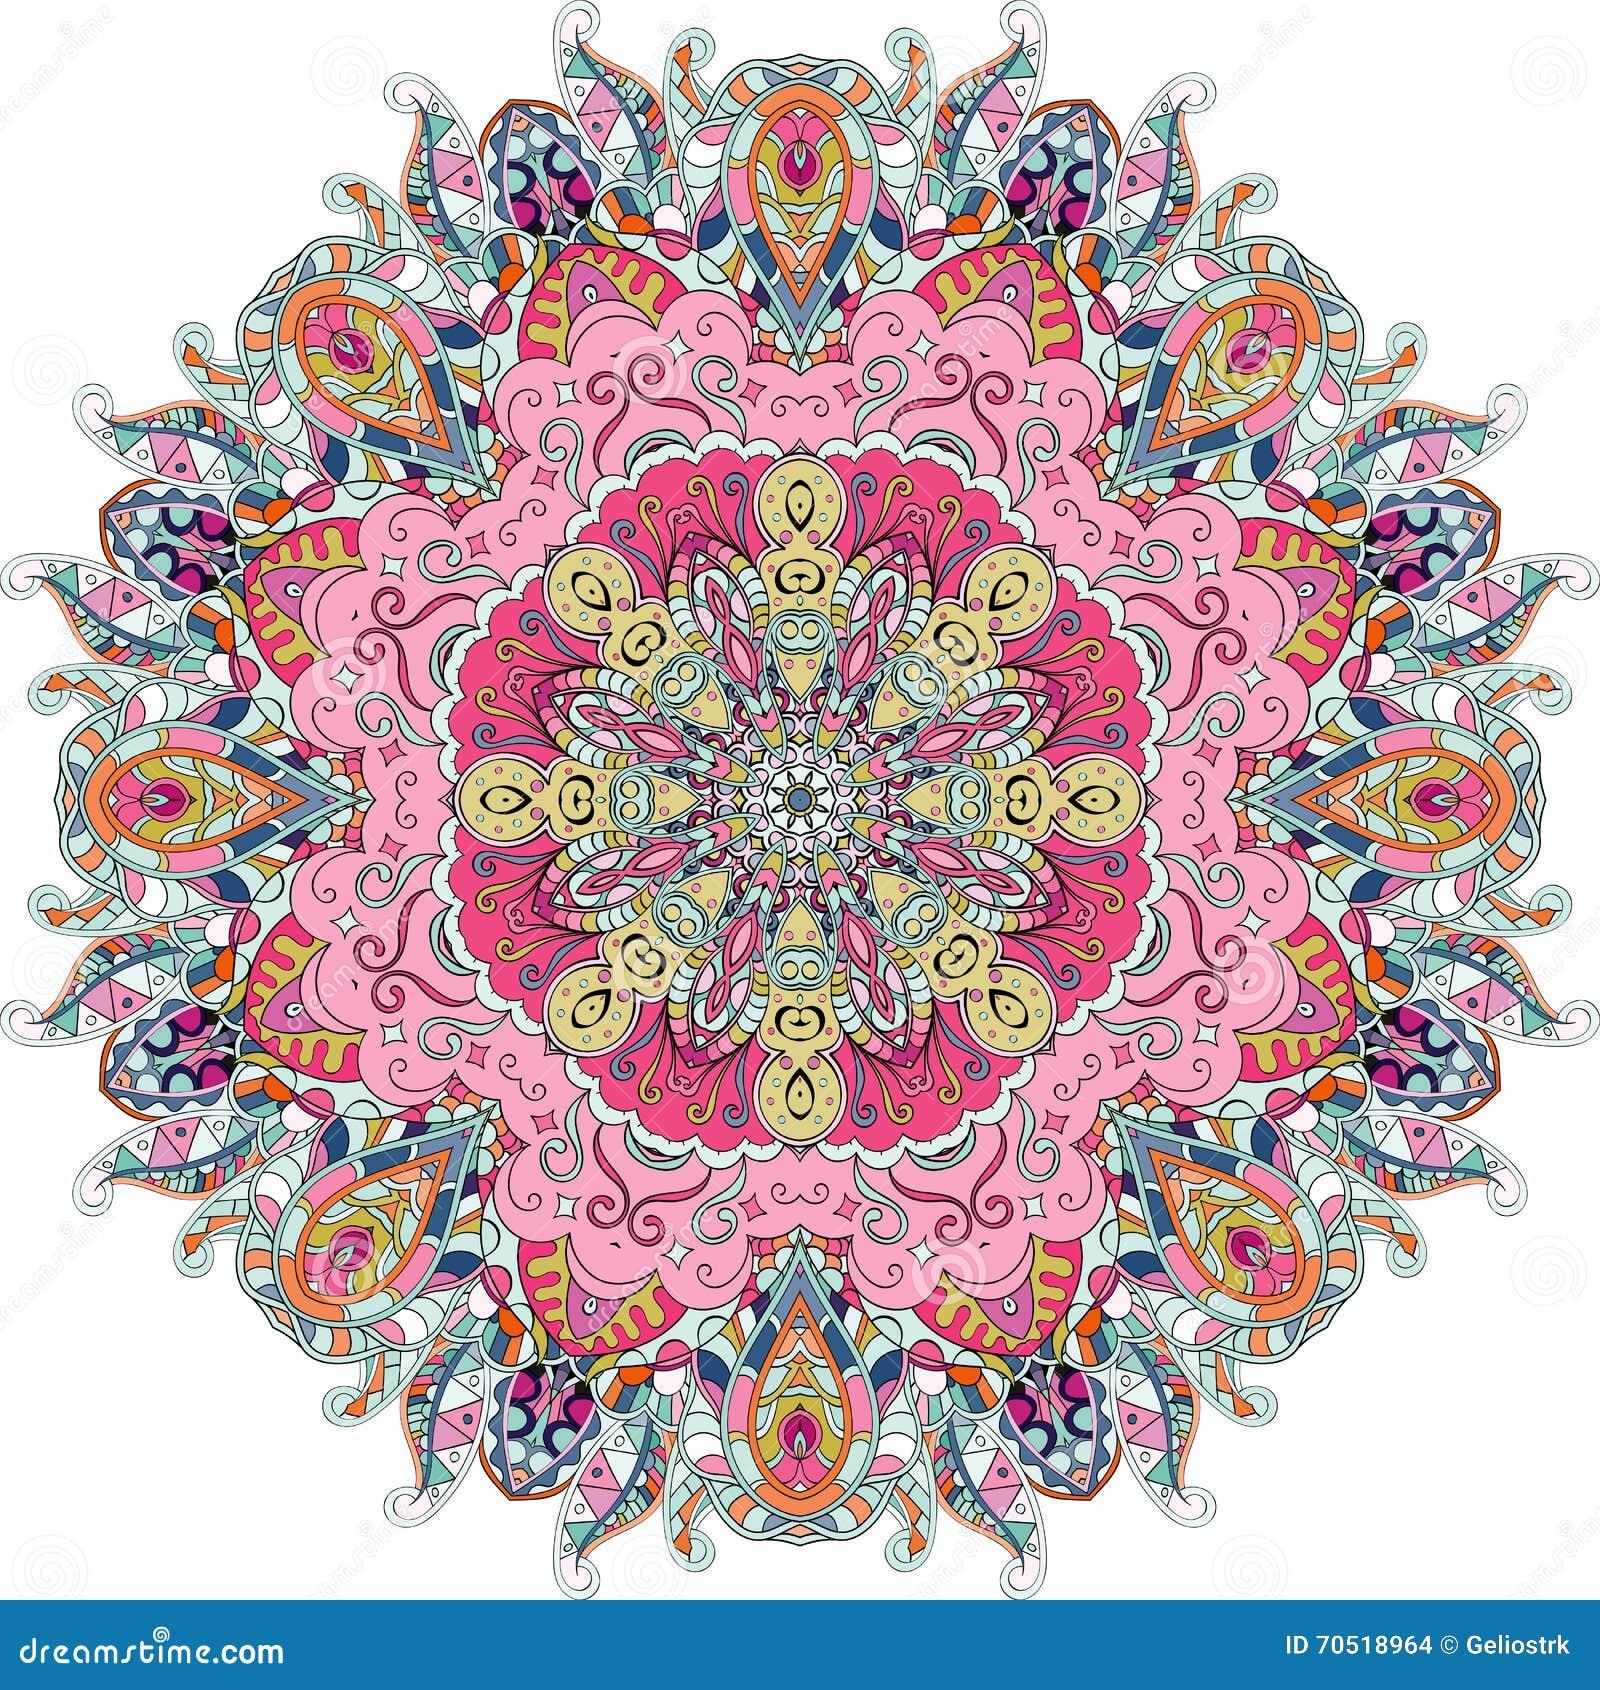 Ornamento étnico del mehndi del Tracery Adorno que calma discreto indiferente, diseño armonioso colorido que garabatea usable Vec